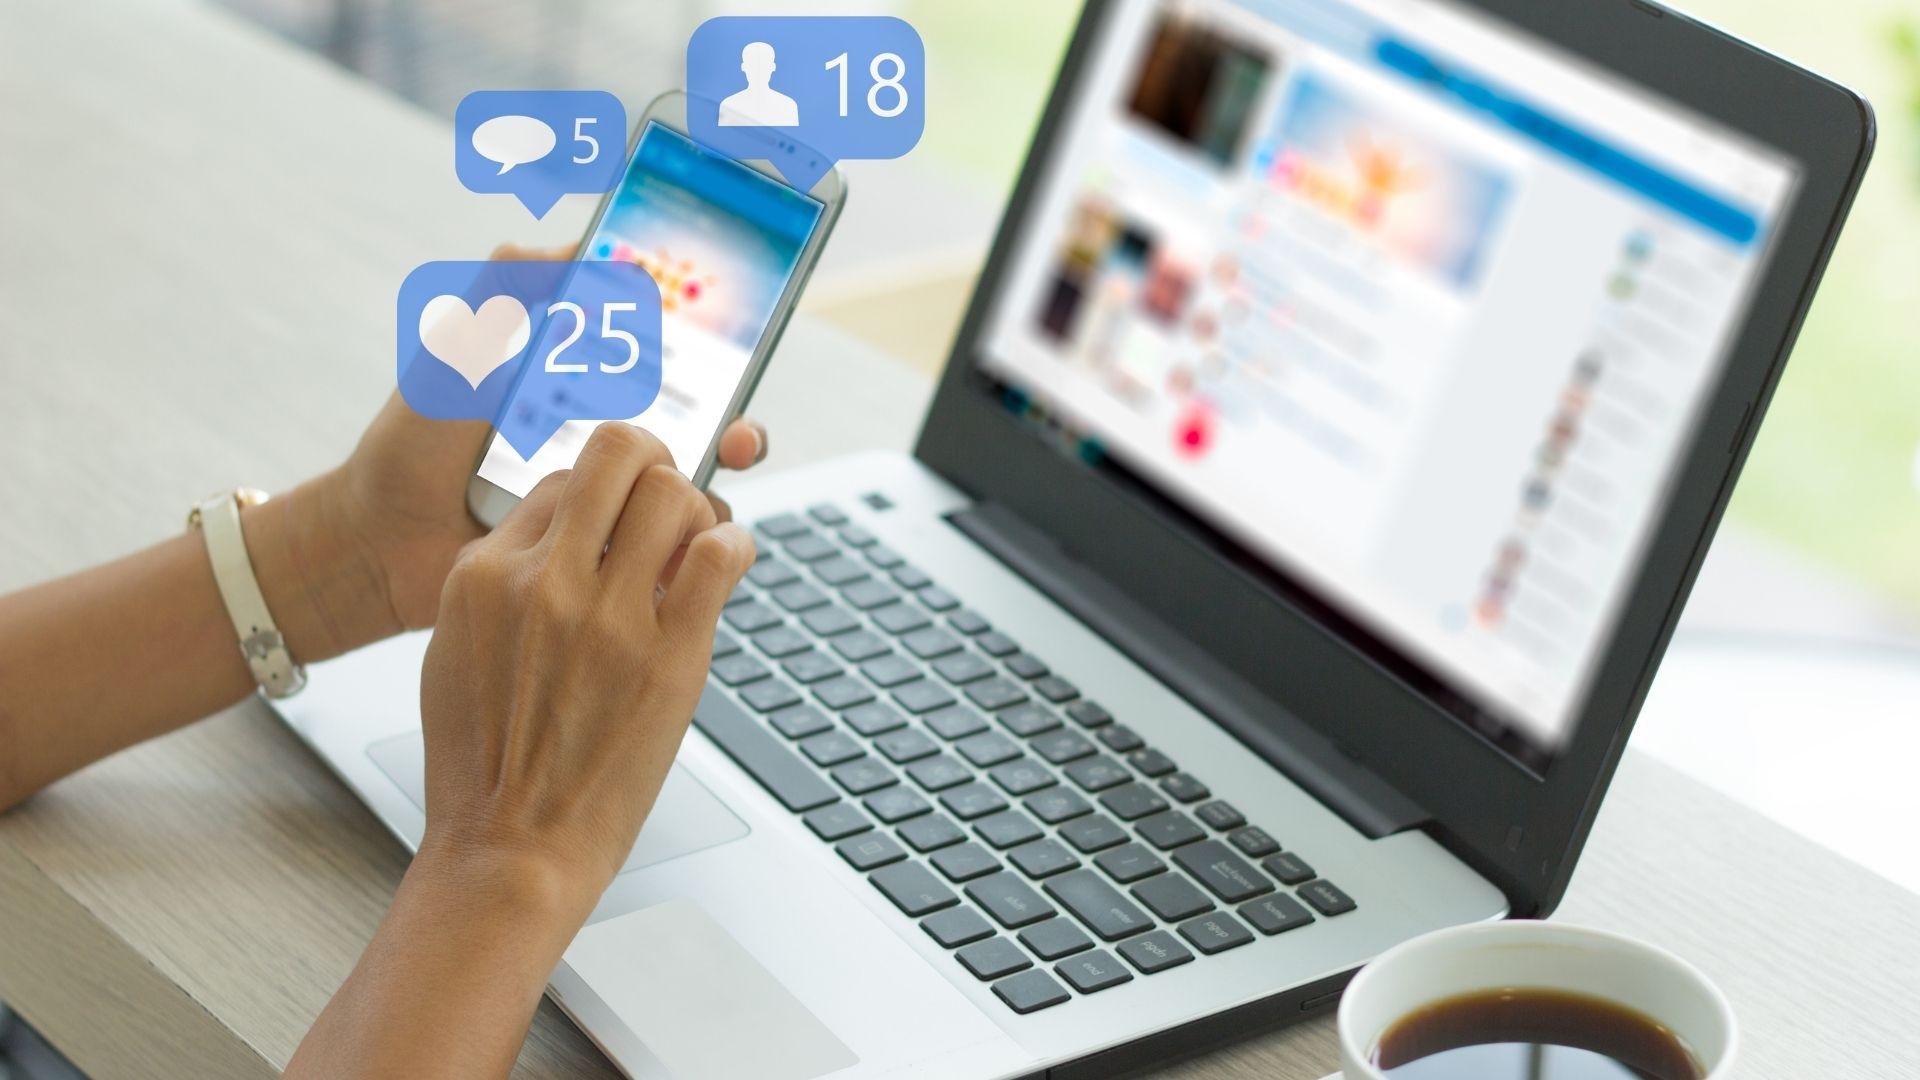 3 Social Media Tips to Grow Your Brand